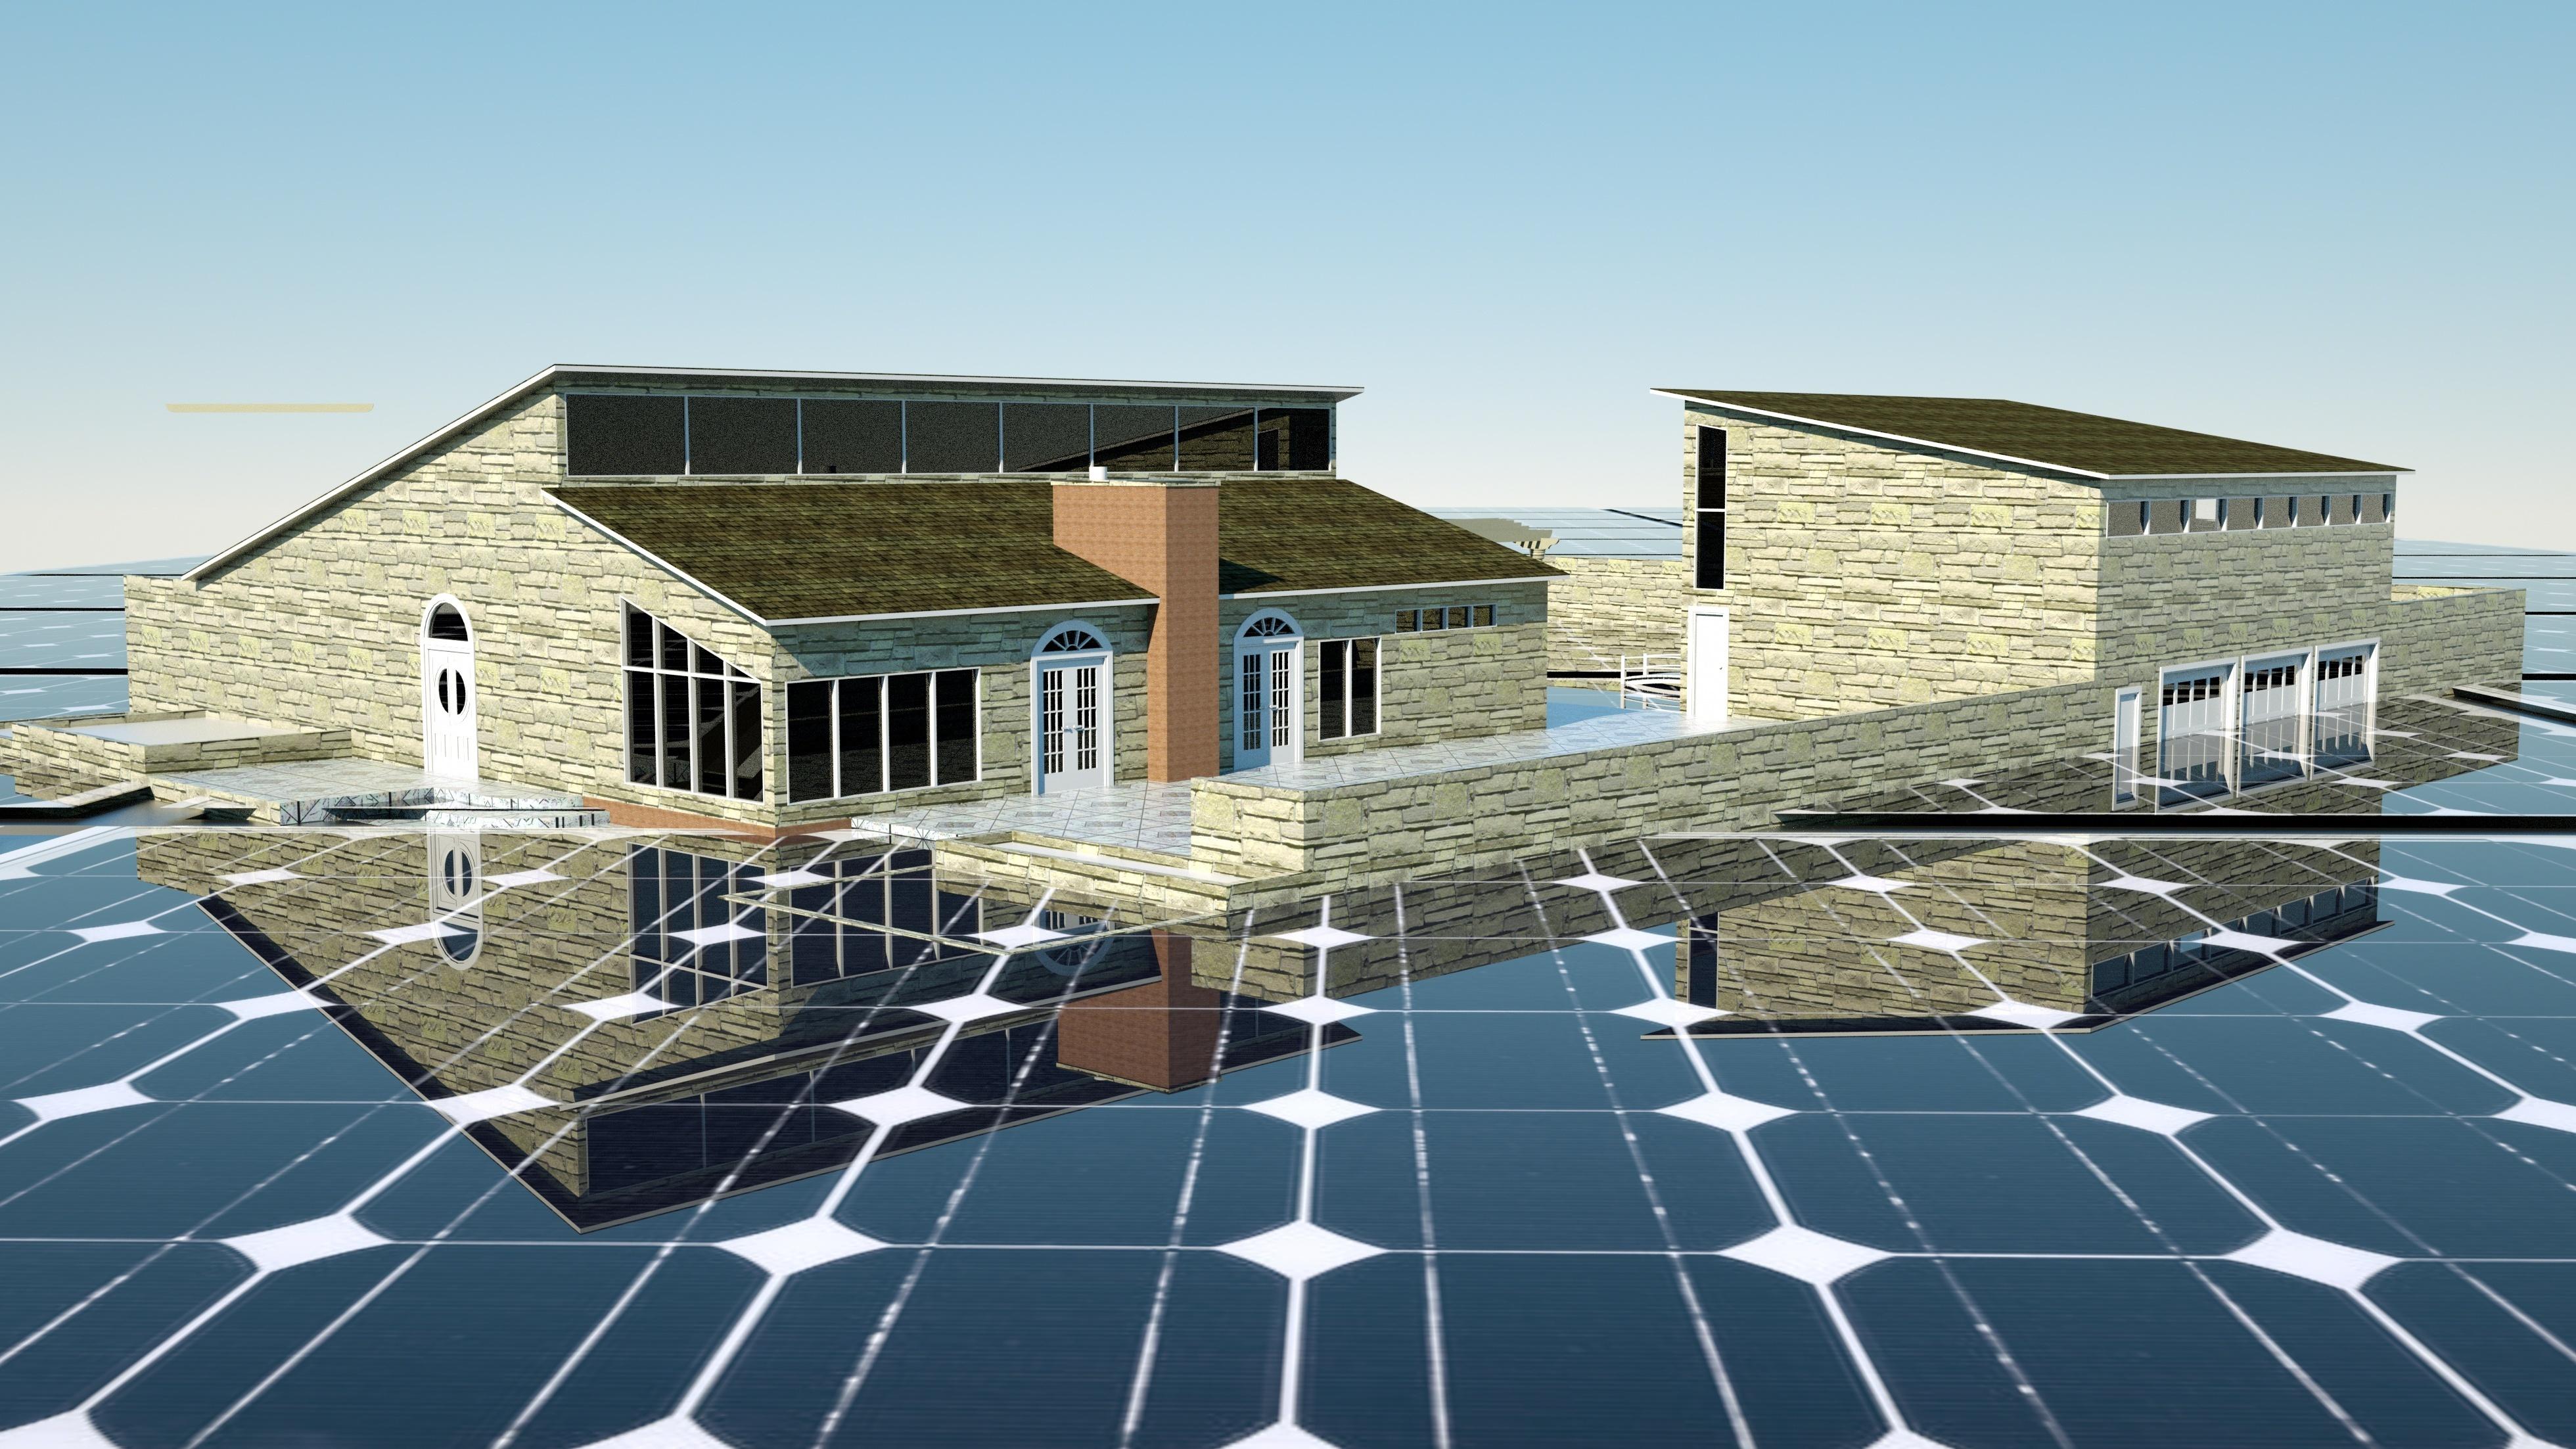 Energetic Solar Inc. image 8